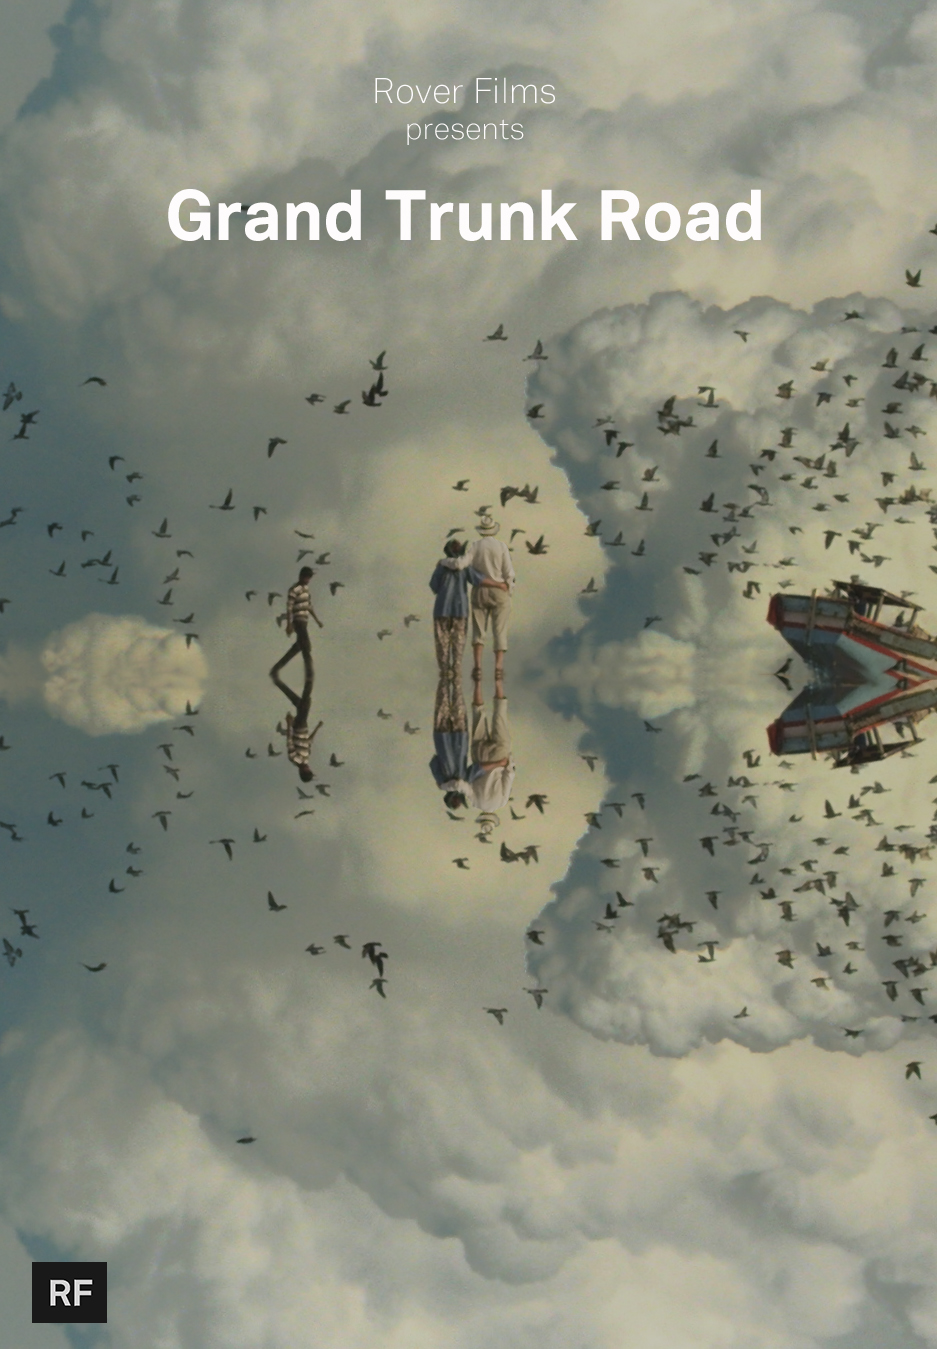 grandtrunkfilmcover1.jpg